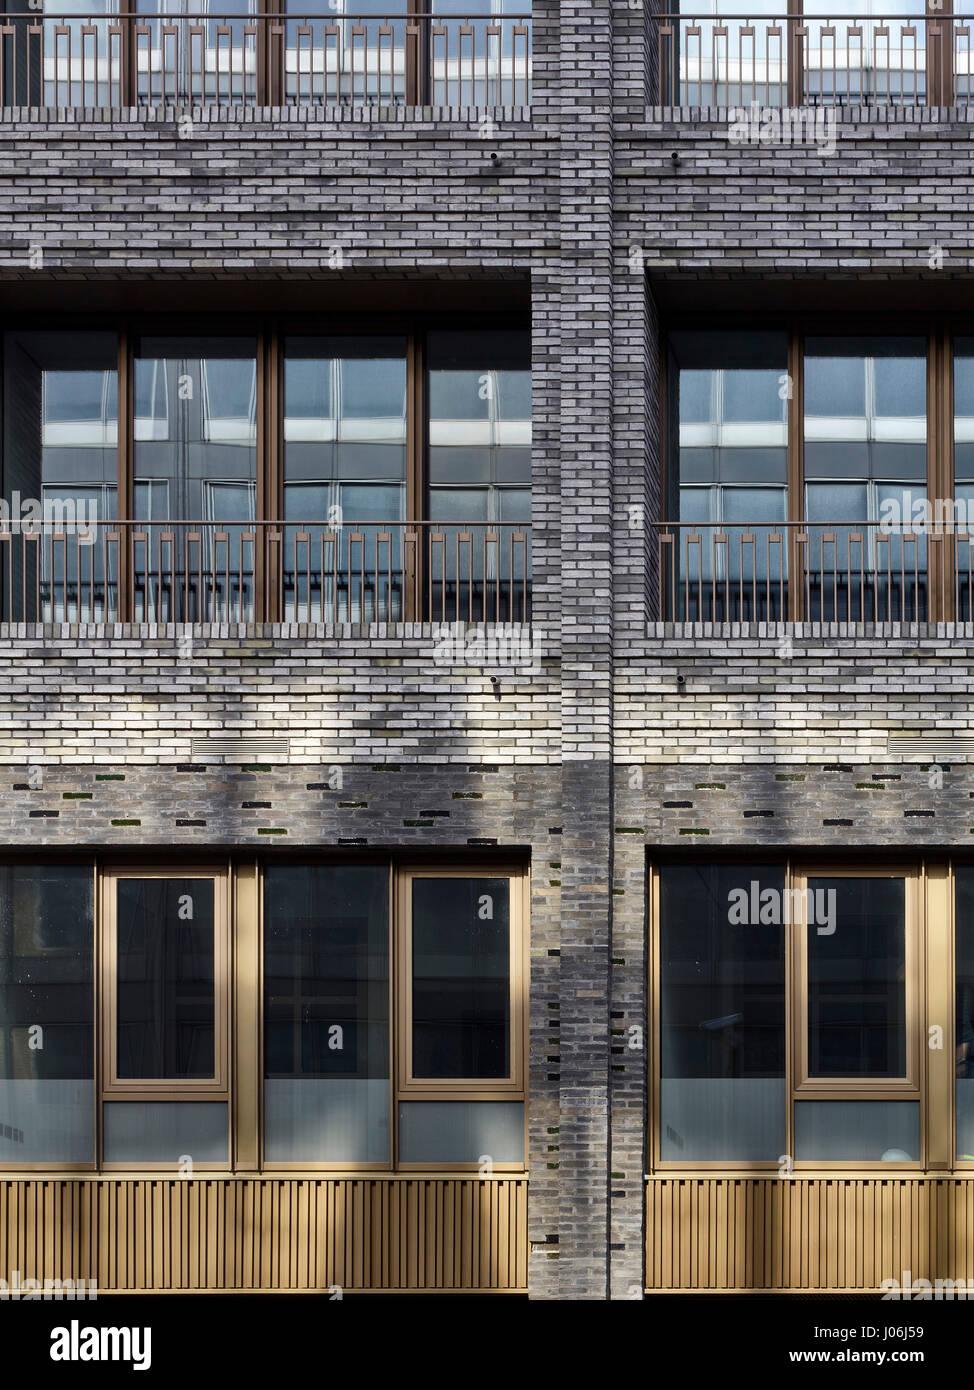 Elevation study. 55 Victoria Street, London, United Kingdom. Architect: Stiff + Trevillion Architects, 2016. - Stock Image